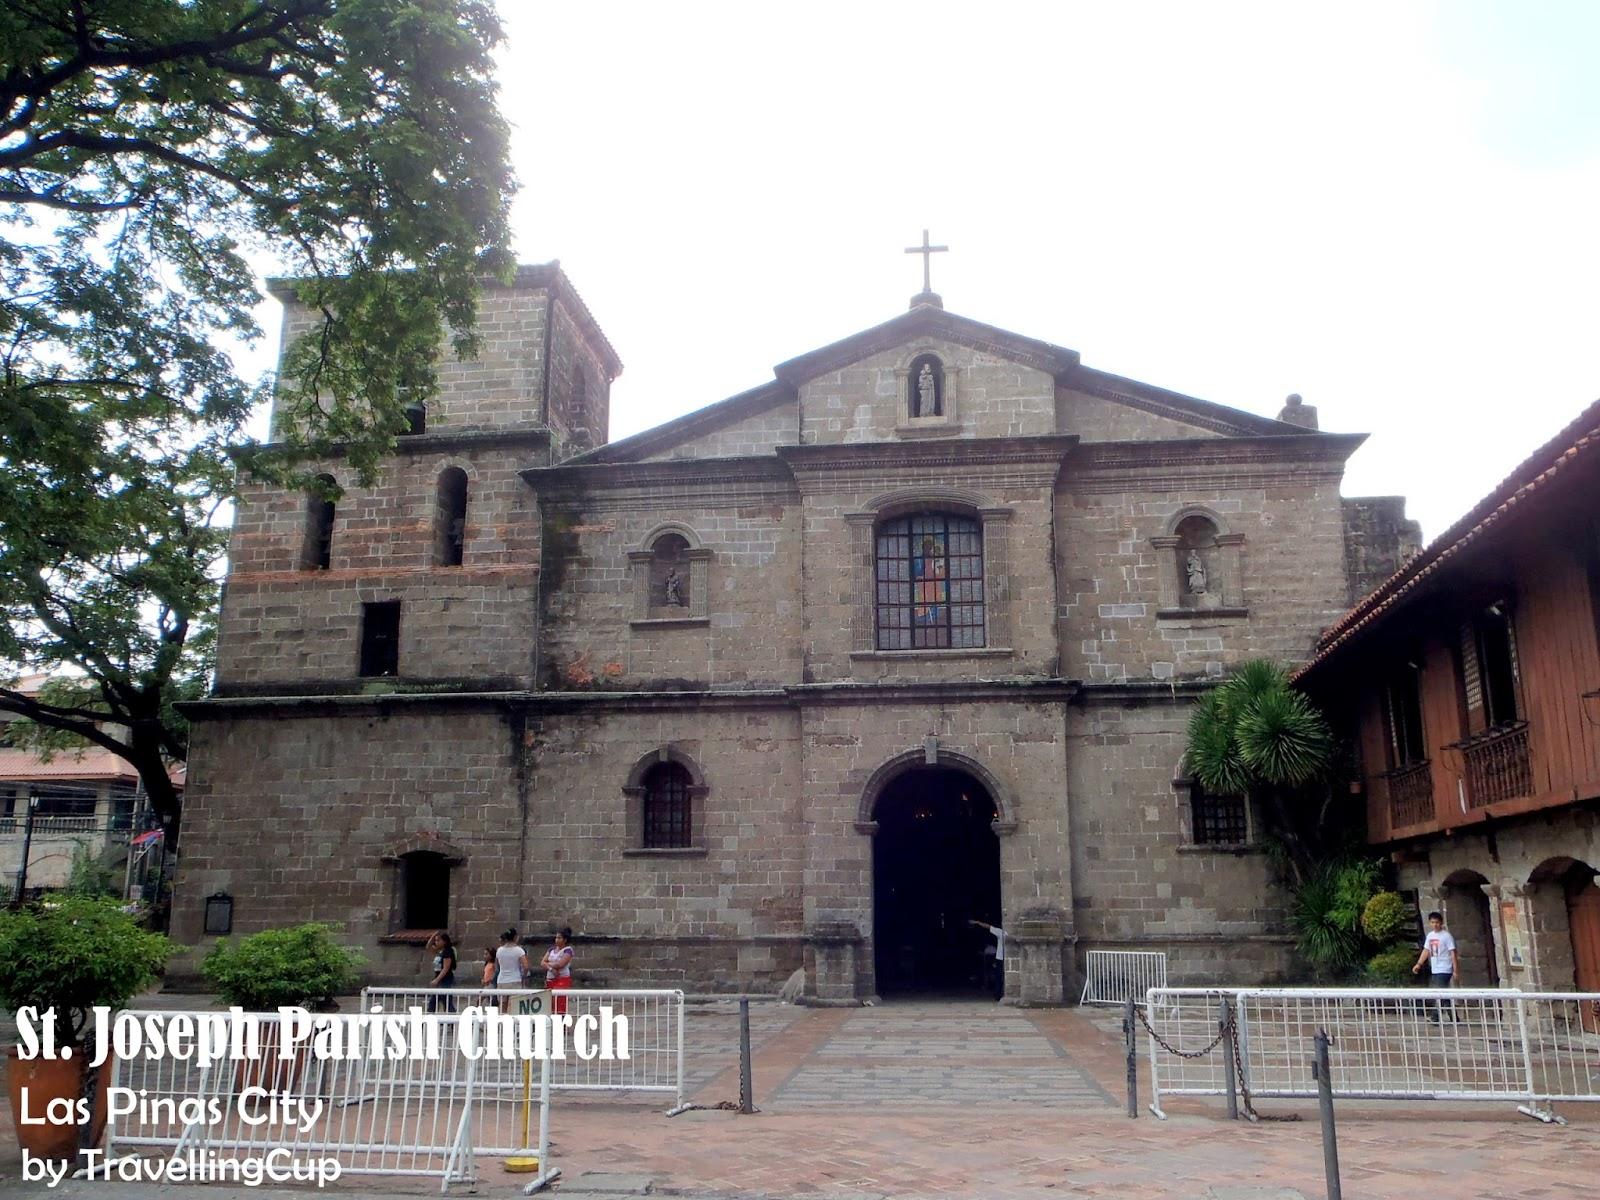 TravellingCup: St. Joseph Parish Church